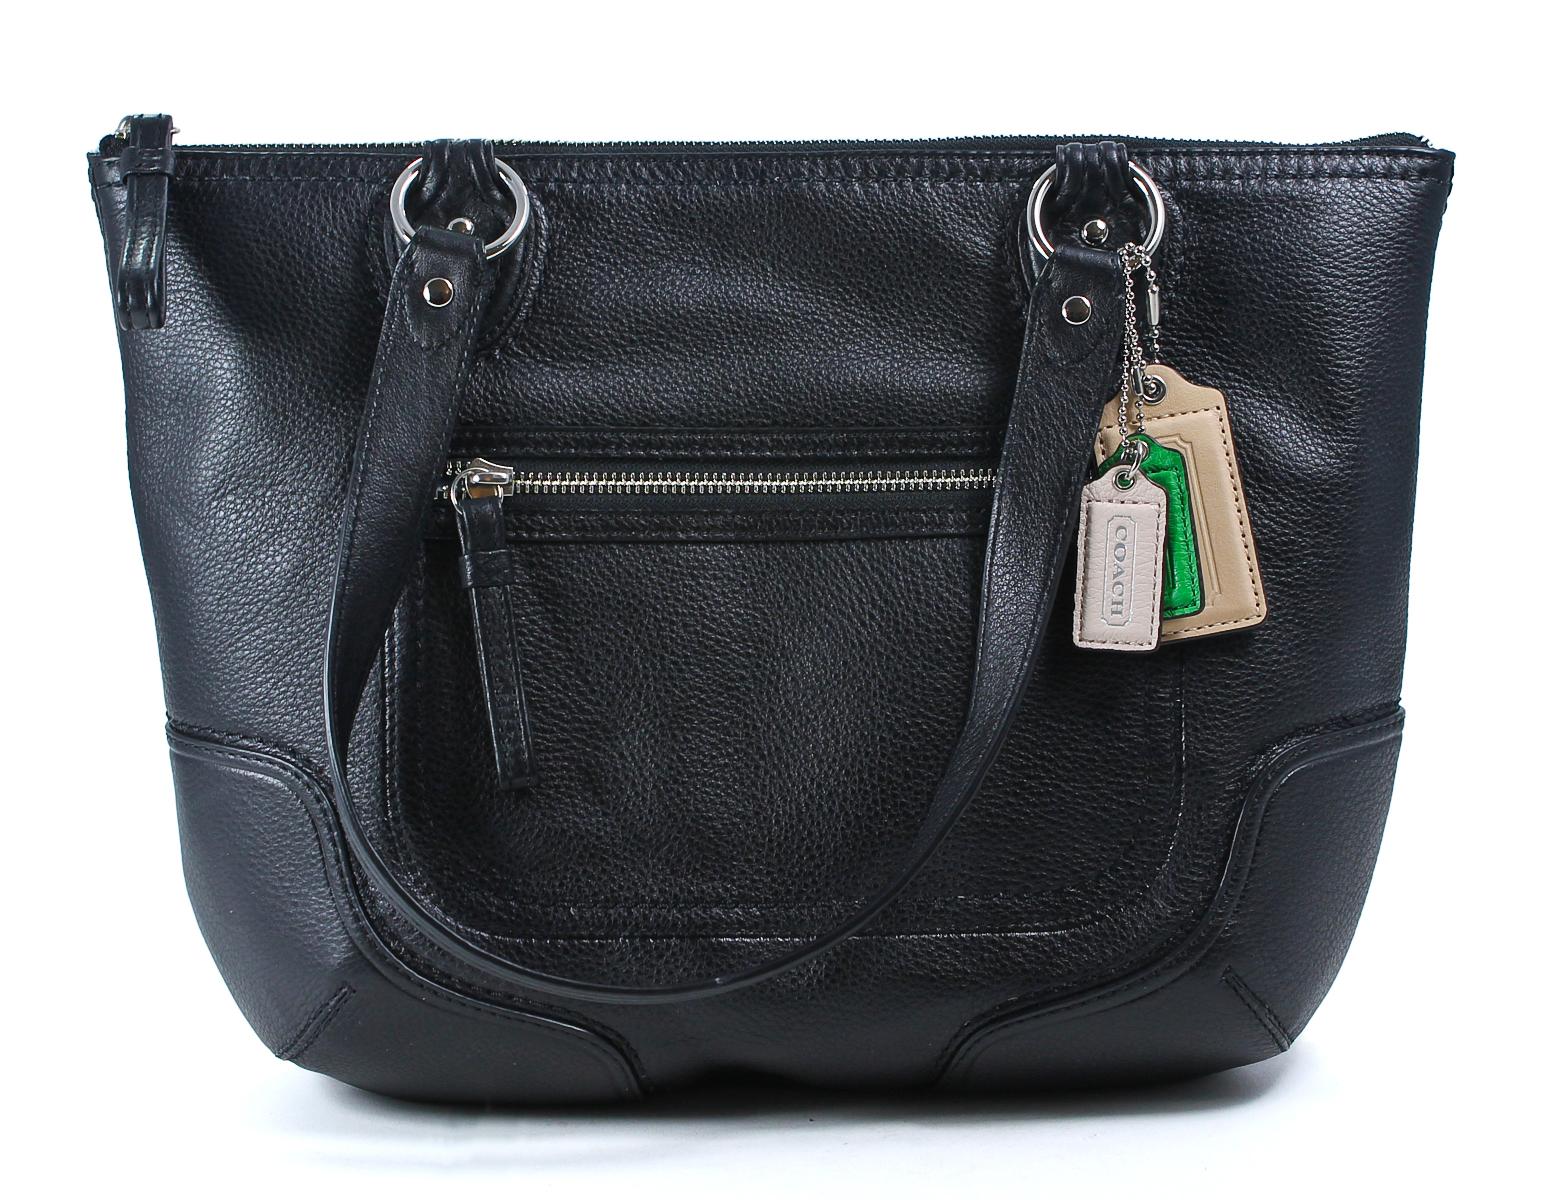 Coach Leather Black 2 Poppy Small Tote Shoulder Handbag ...